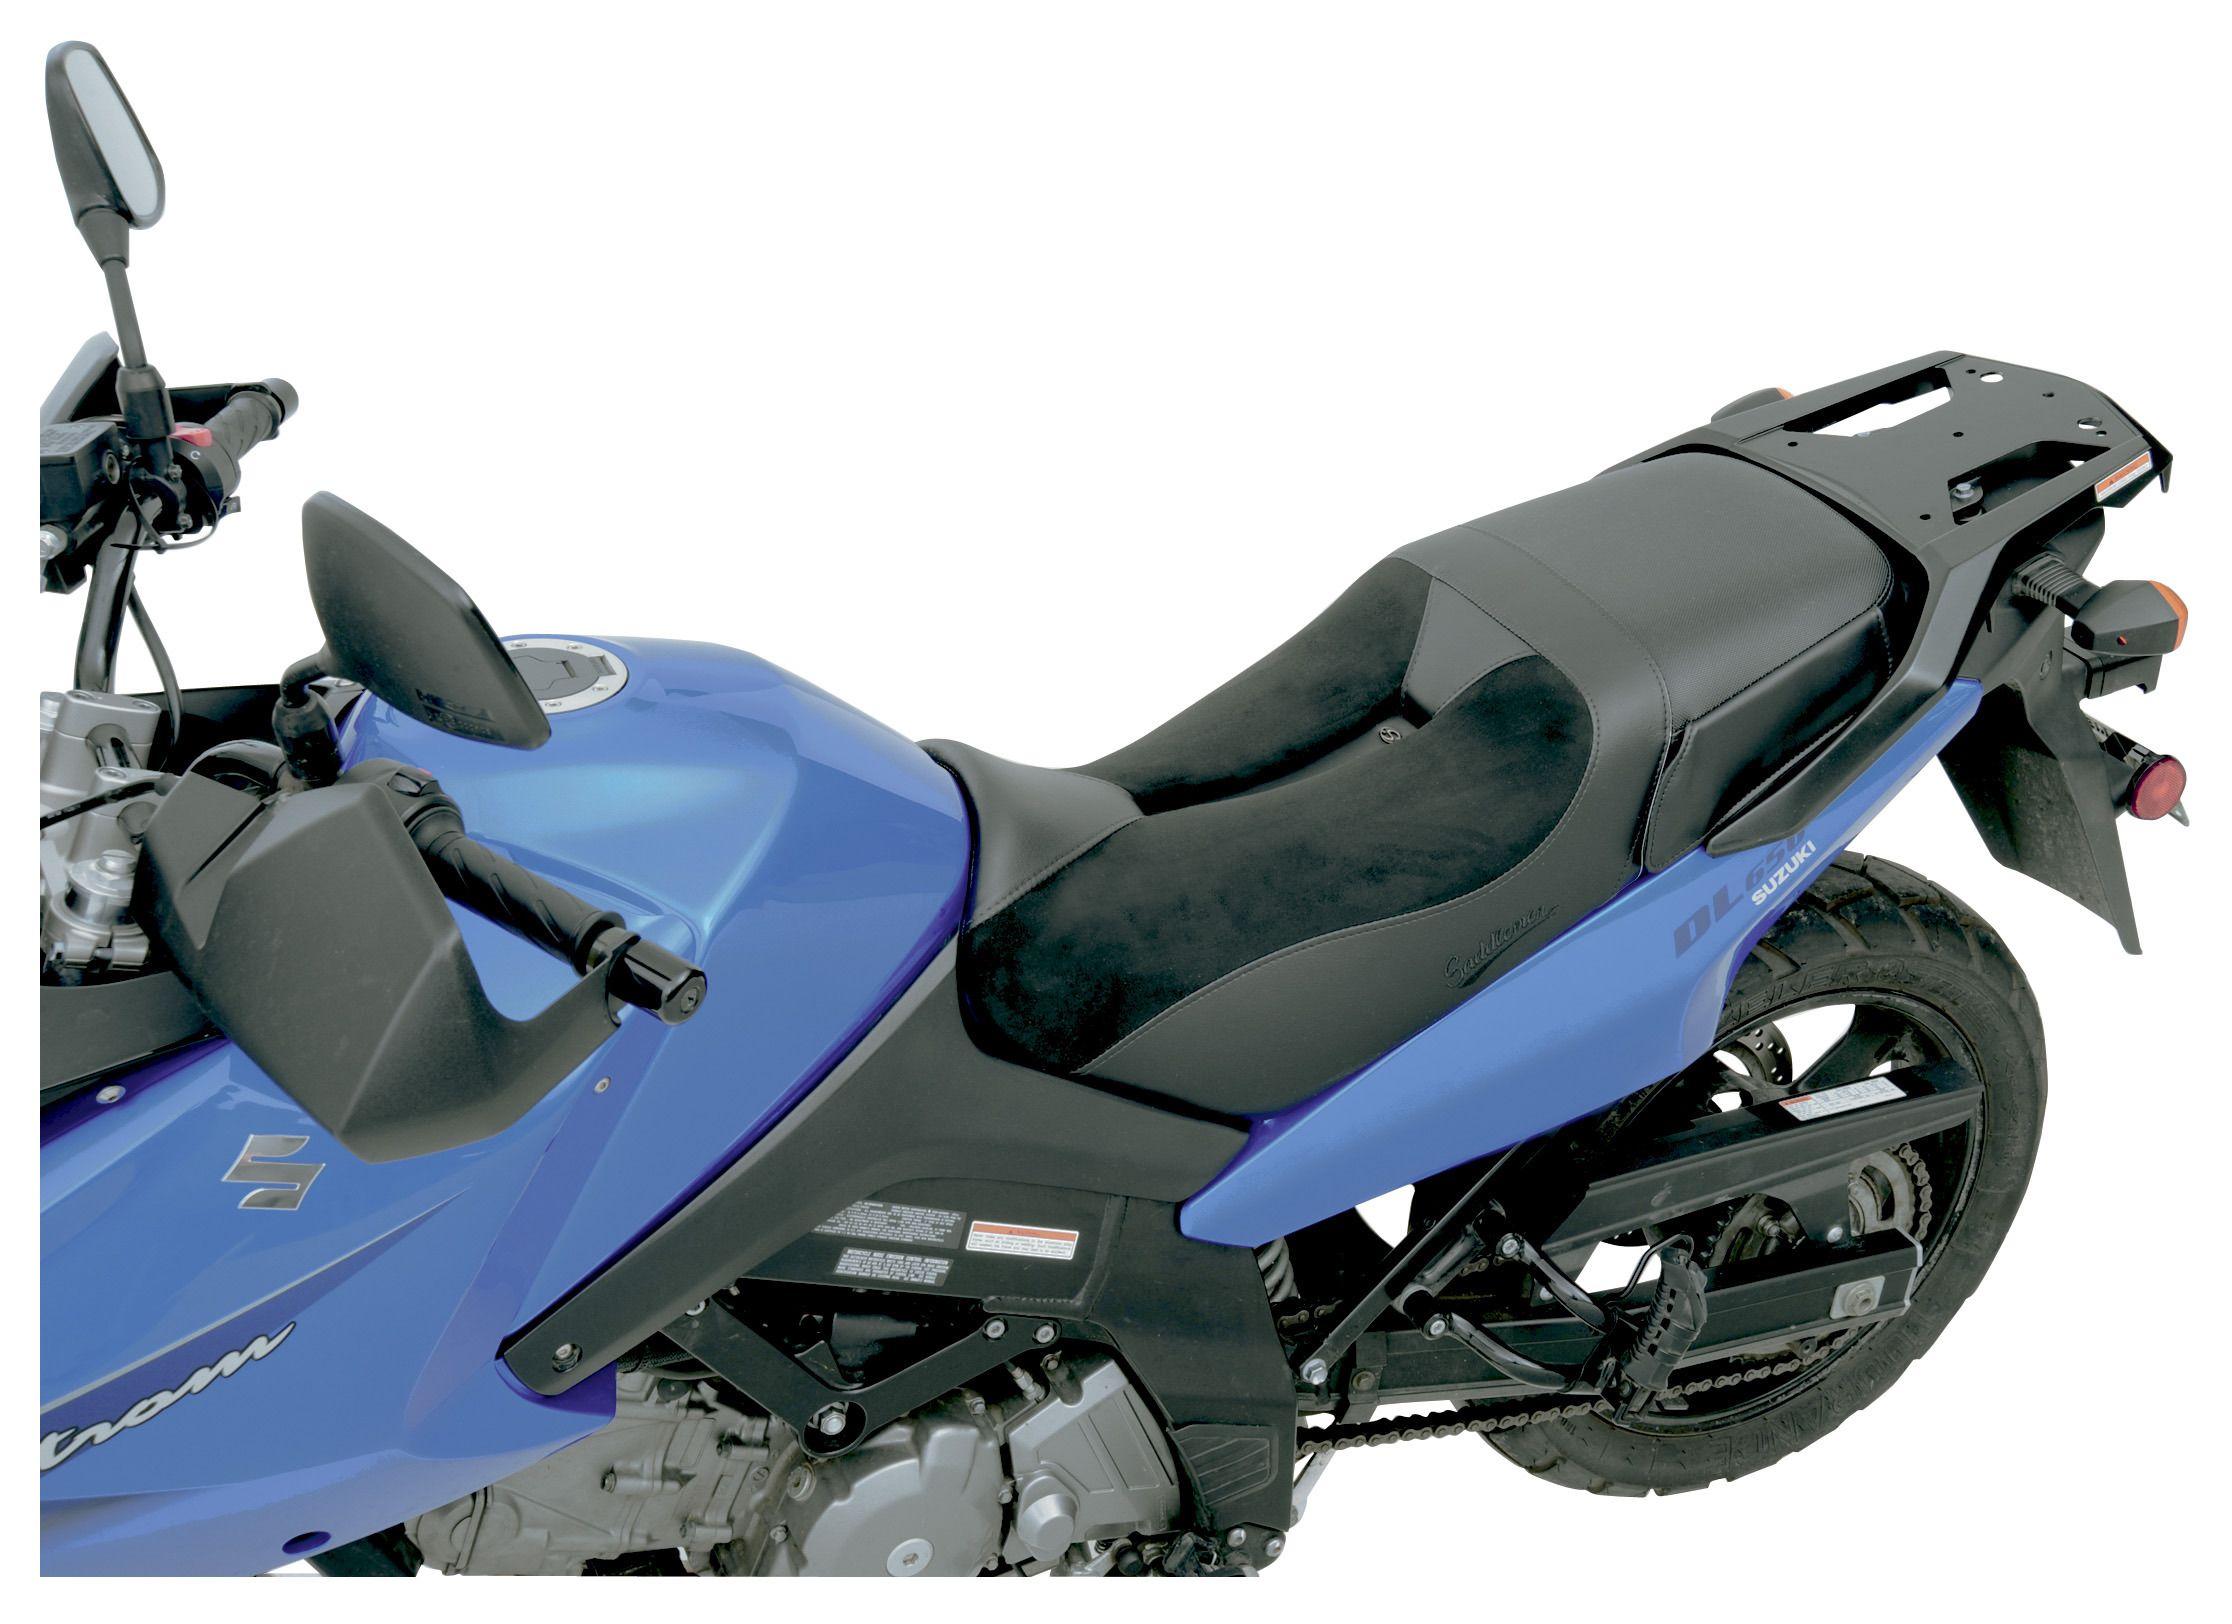 Tremendous Saddlemen Adventure Track Seat Suzuki V Strom 650 1000 Gamerscity Chair Design For Home Gamerscityorg